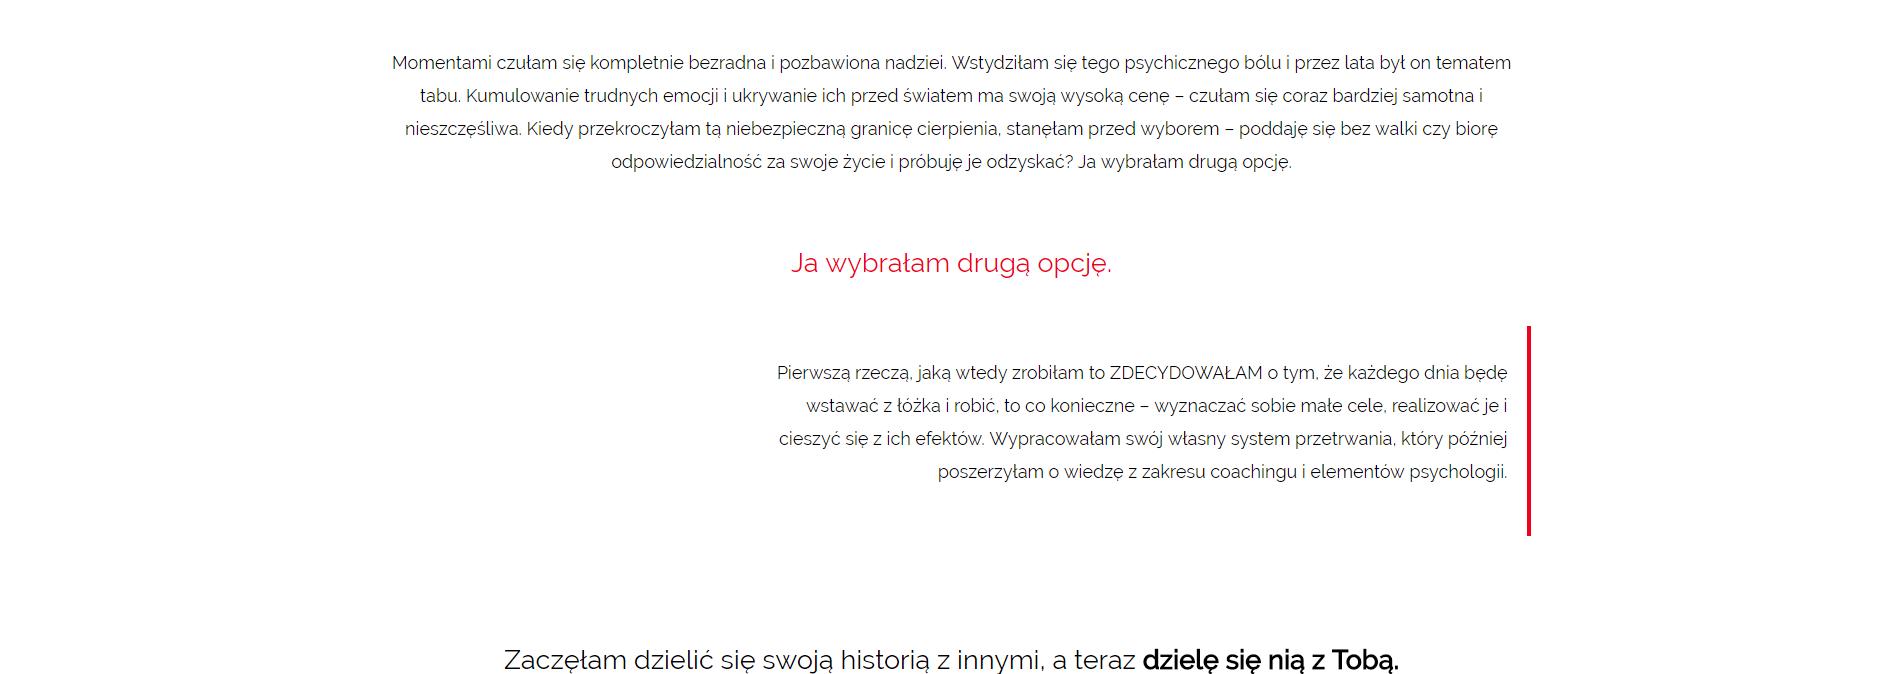 Moja historia Joanna Szendzikowska (1)